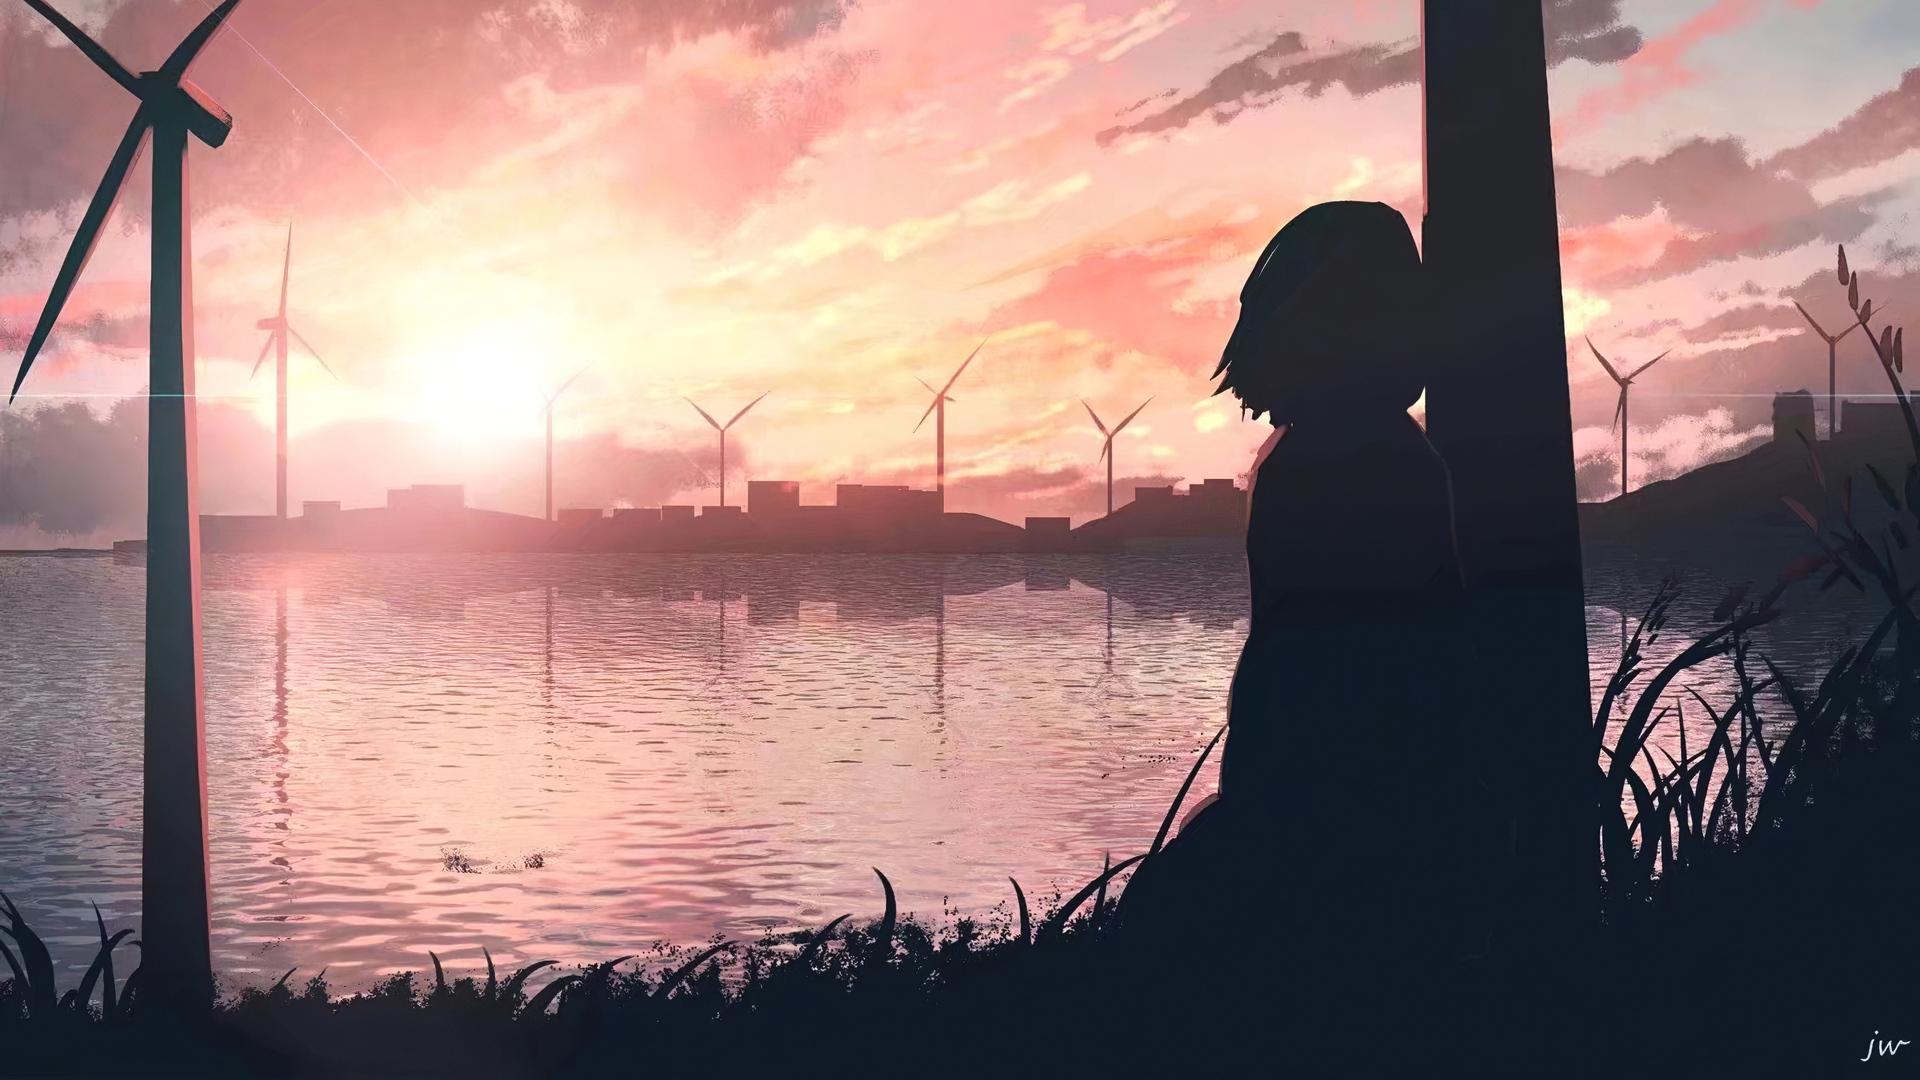 1920x1080 Sad Anime Girl 4k Laptop Full HD 1080P HD 4k ...